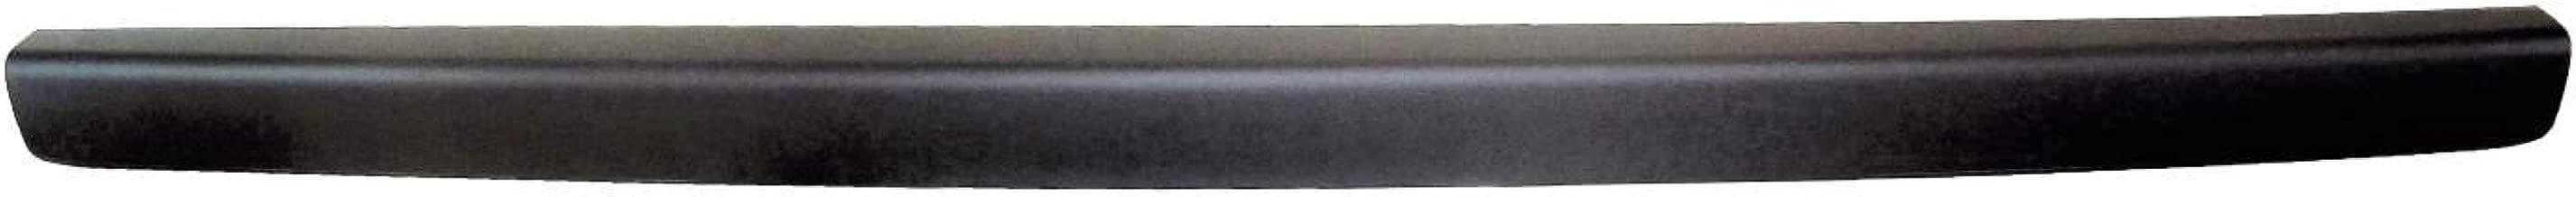 PT Auto Warehouse GM-5523A-TG2 - Tailgate Molding, Black - Upper, Non-Spoiler Style, for Fleetside ONLY